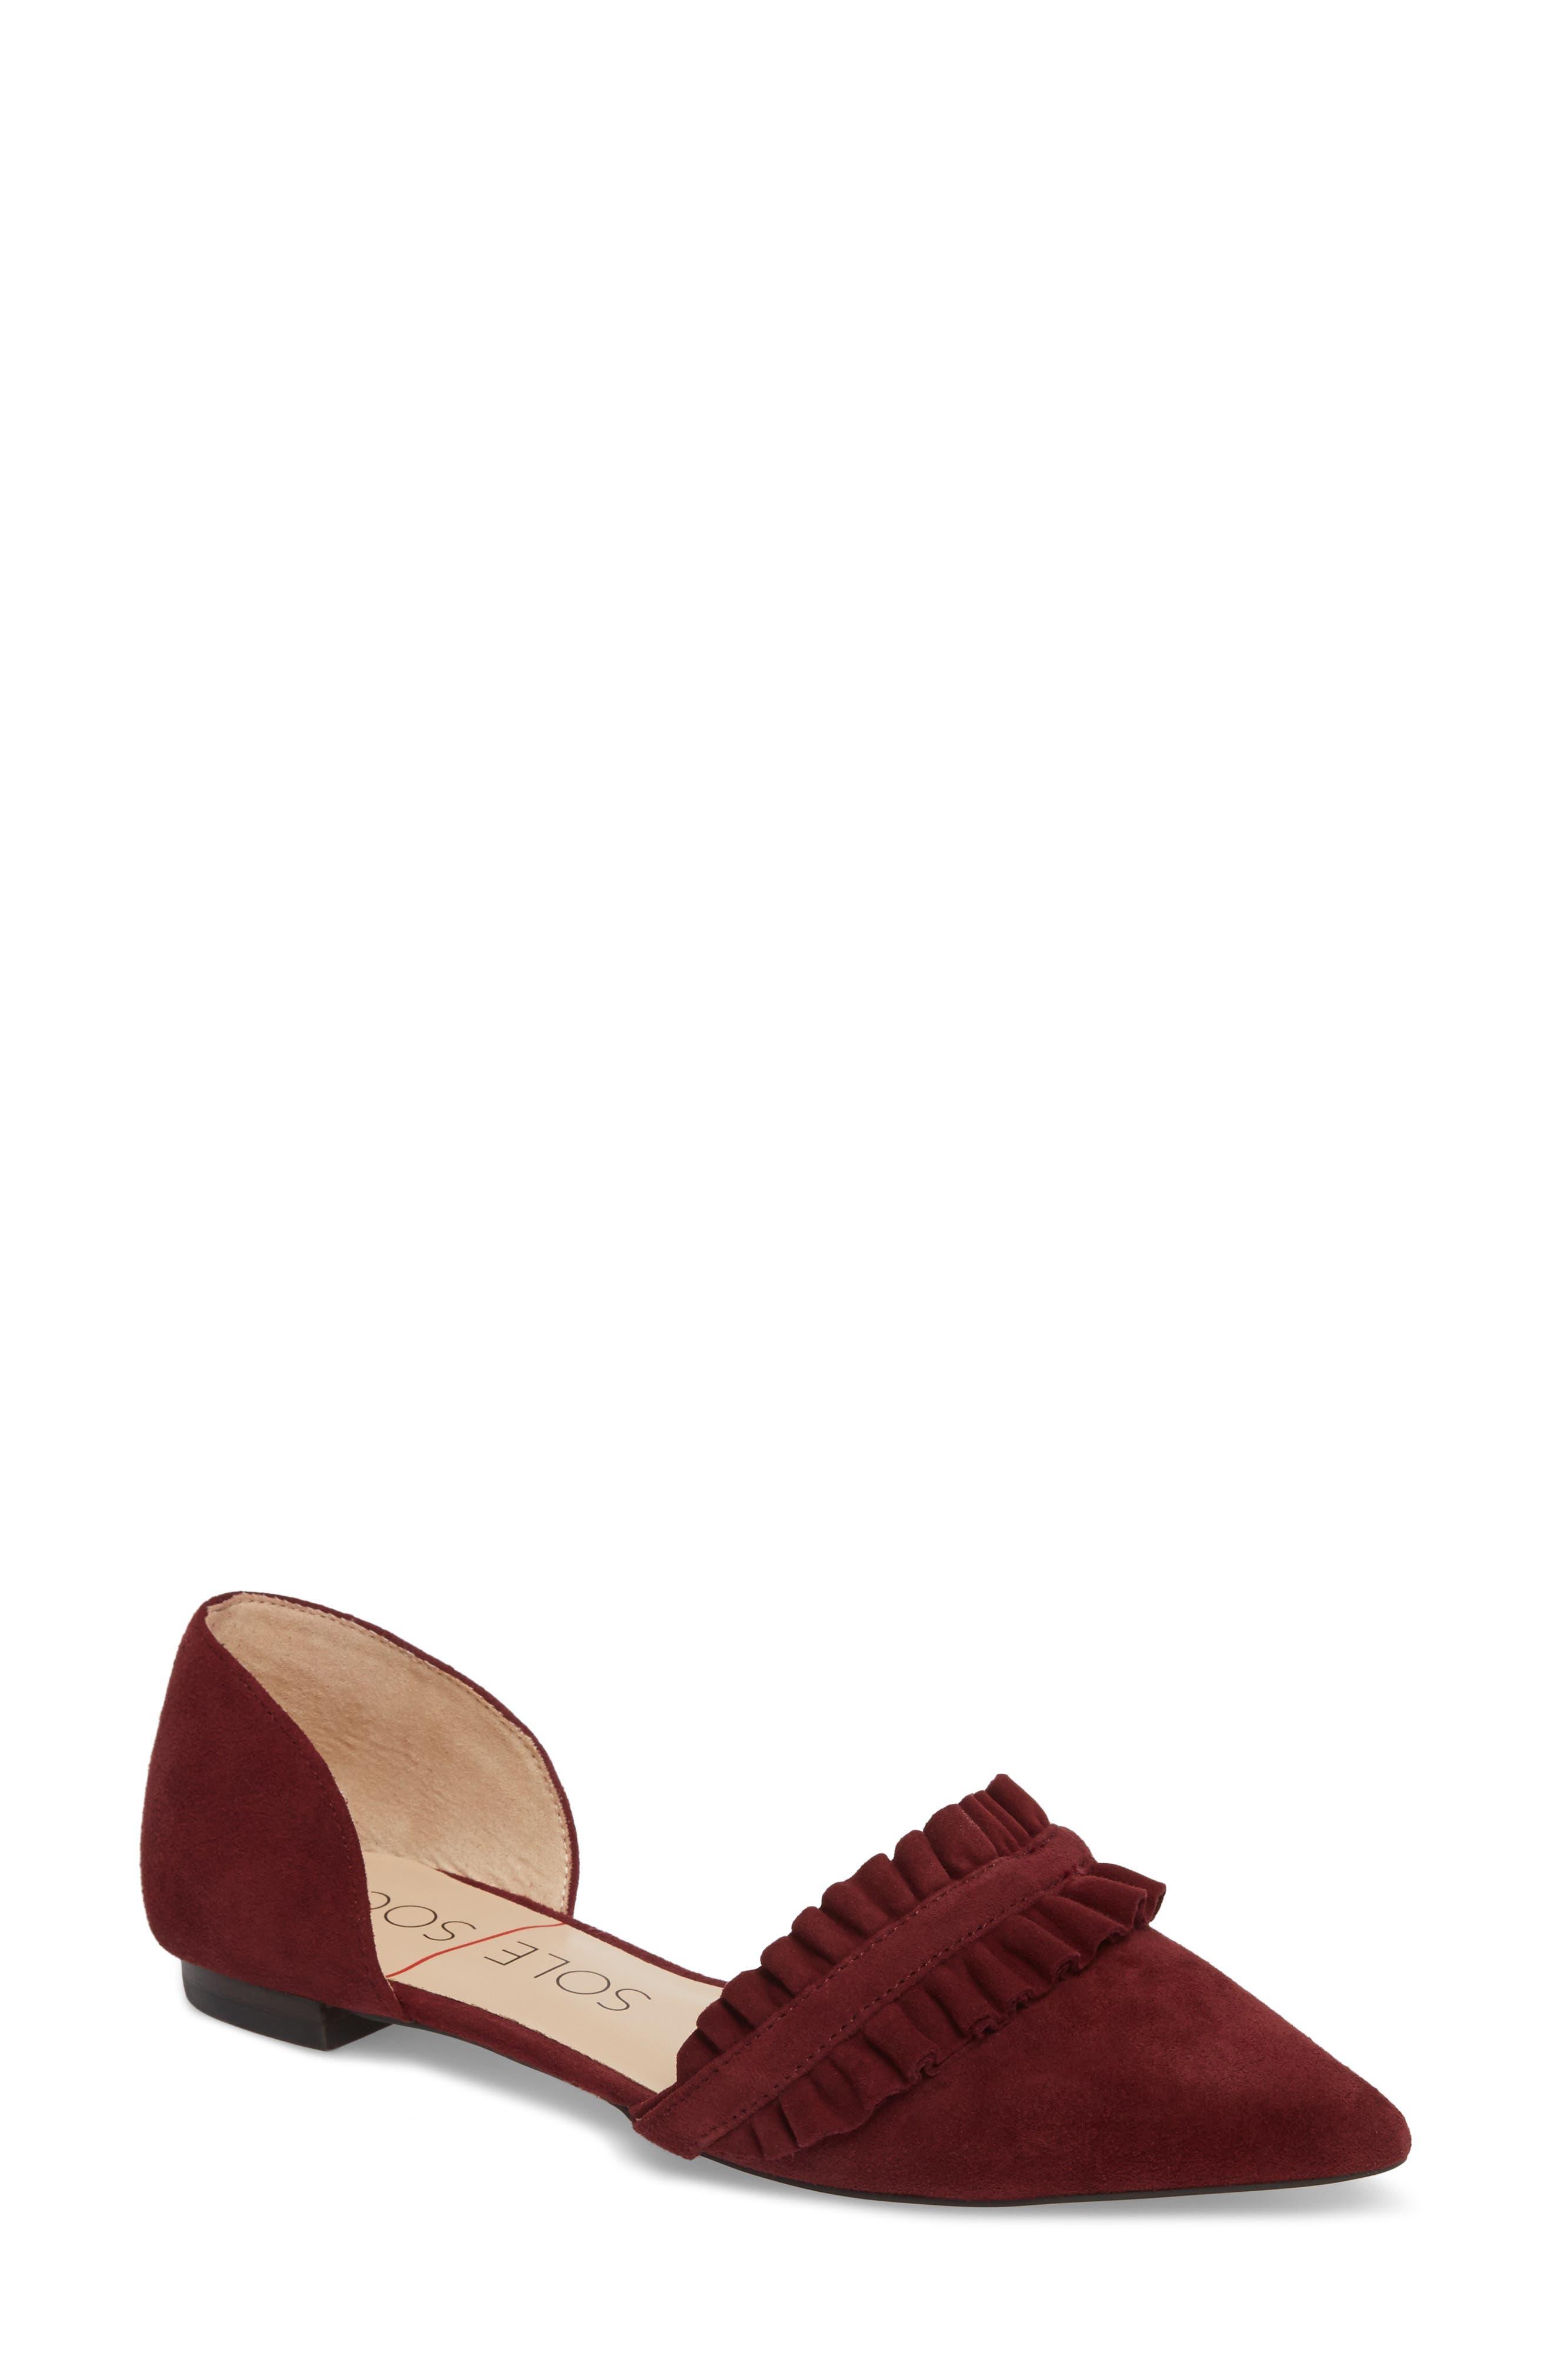 Alternate Image 1 Selected - Sole Society Rosalind Ruffle d'Orsay Flat (Women)